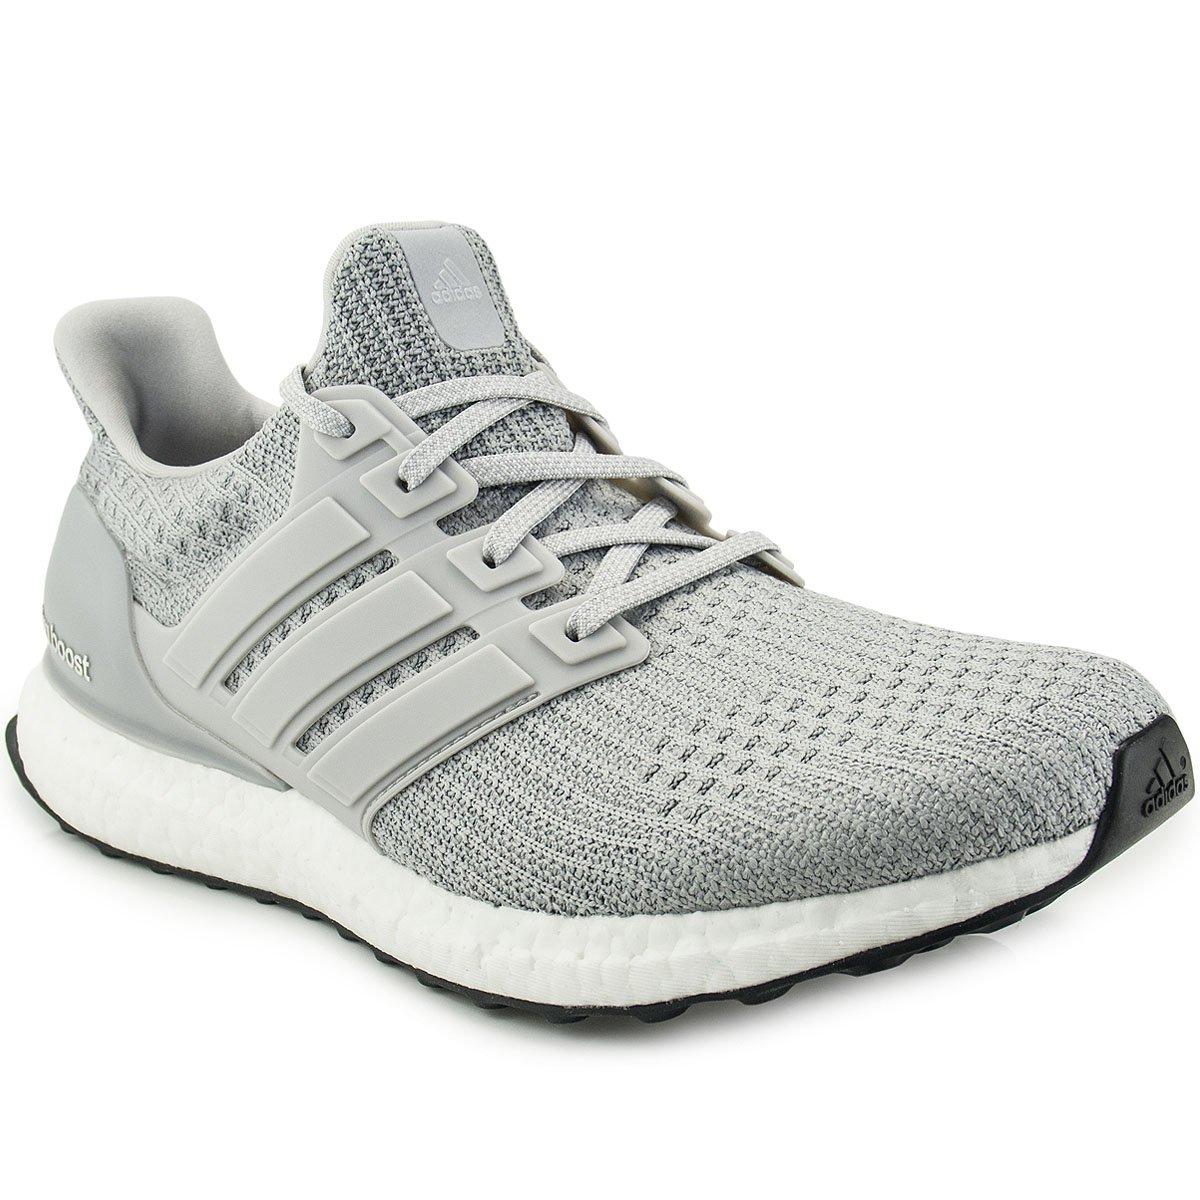 9ef1c9956d Tênis Adidas Ultra Boost